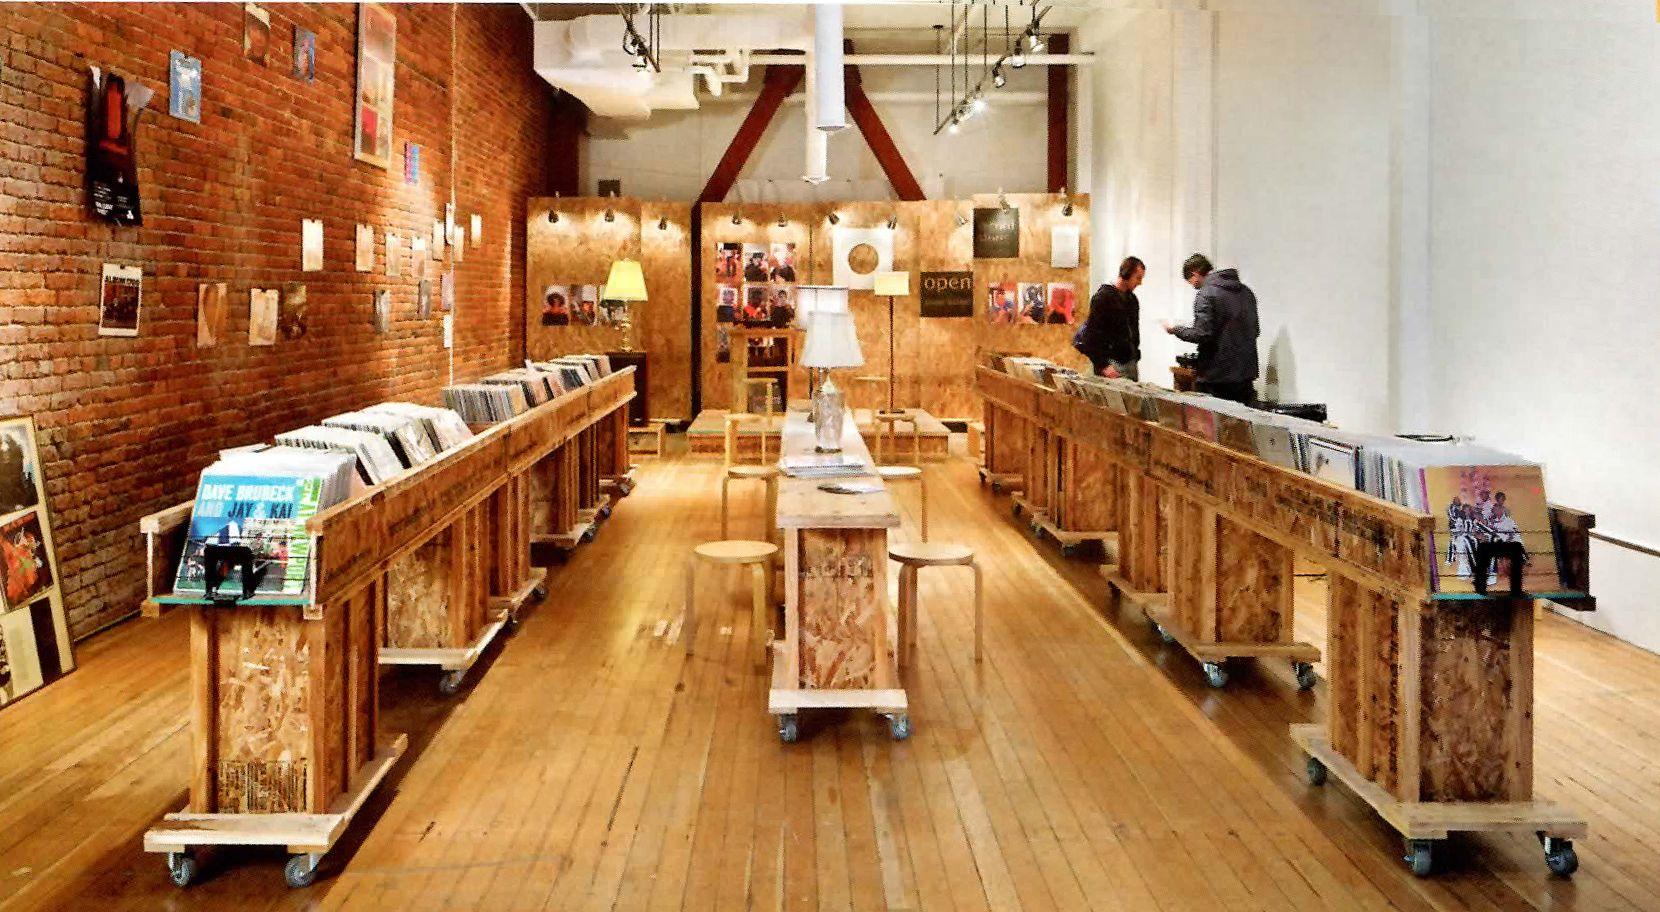 Cool record store  From Interior Design Magazine